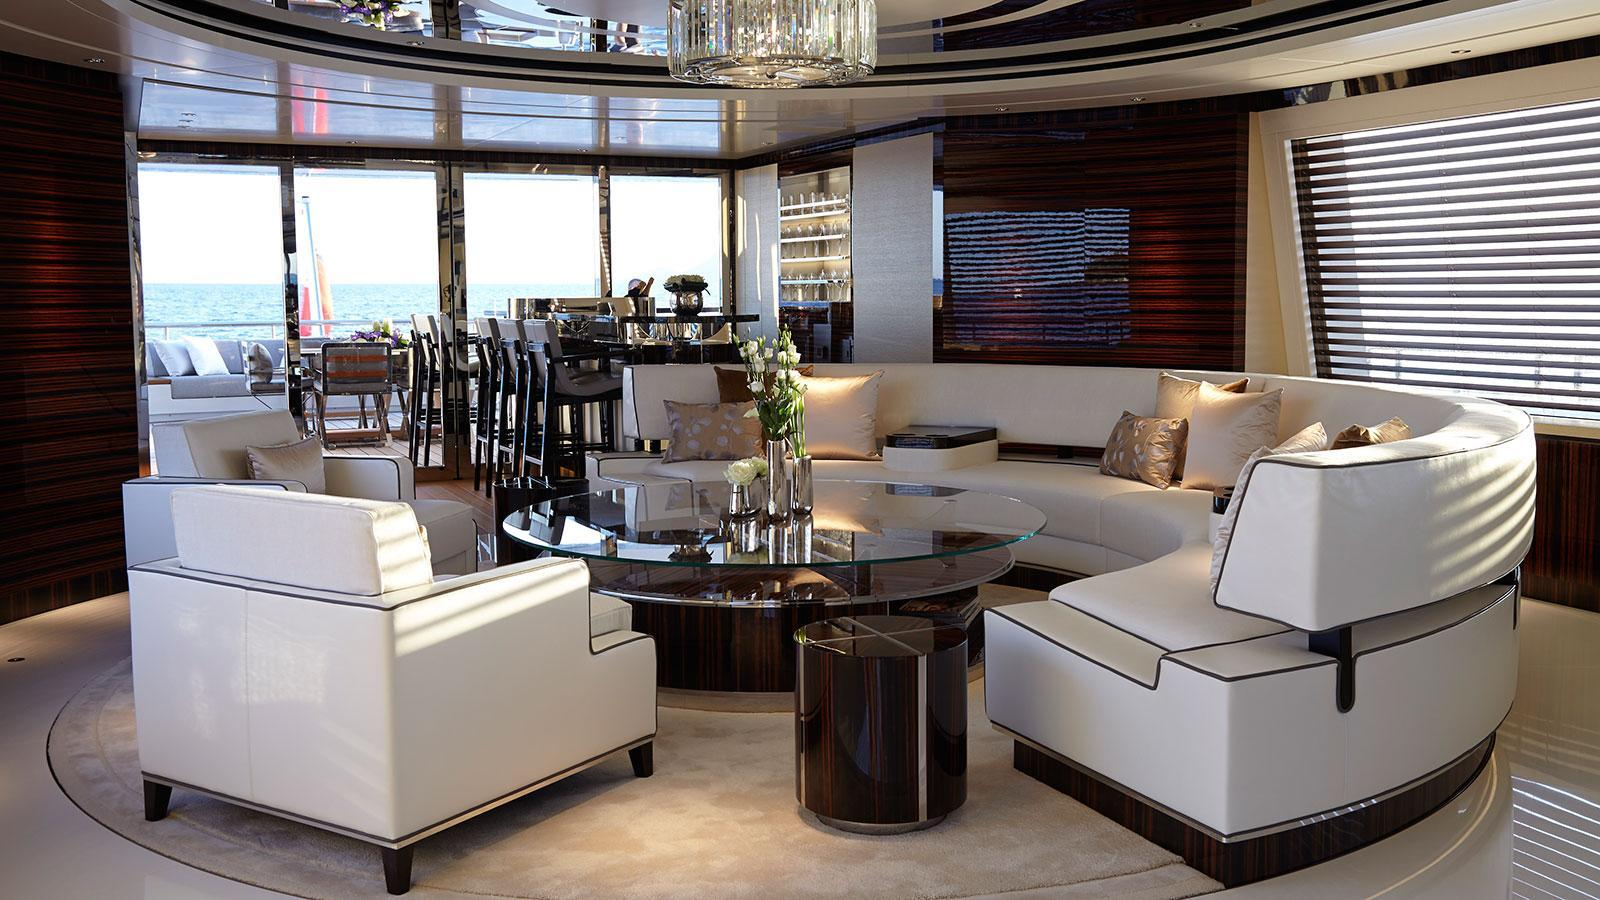 lady-may-motor-yacht-feadship-46m-2014-circular seating-saloon